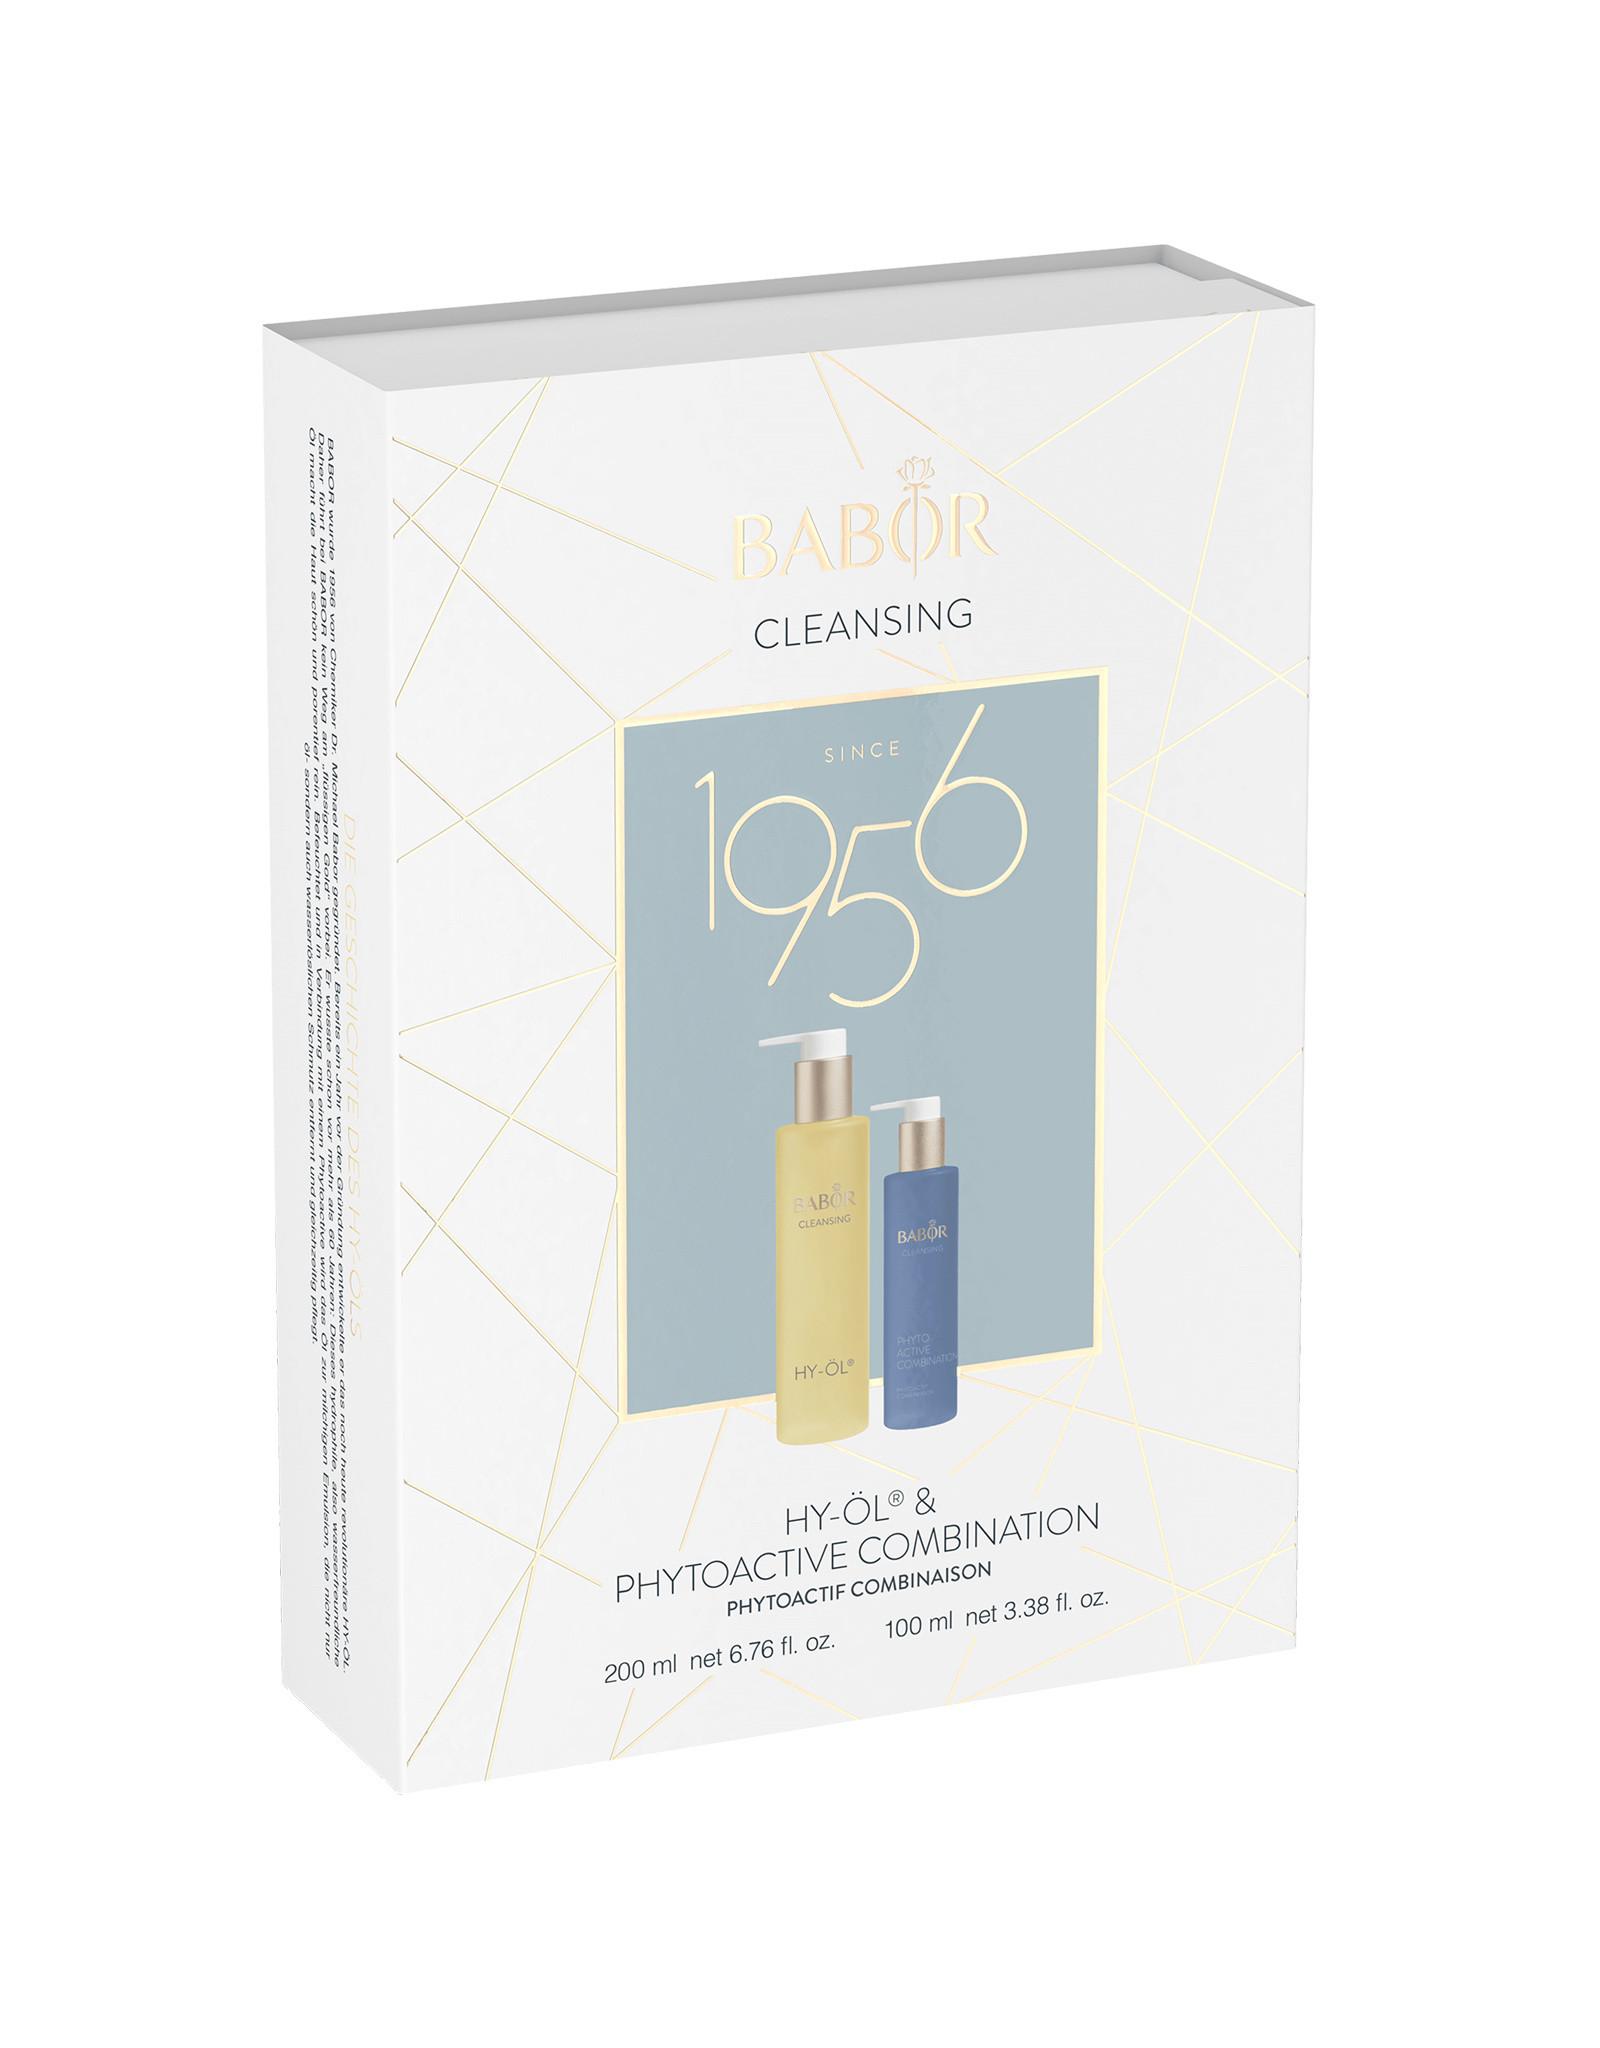 BABOR CLEANSING PROMOSET HY-ÖL & COMBINATION 2021 2 SET